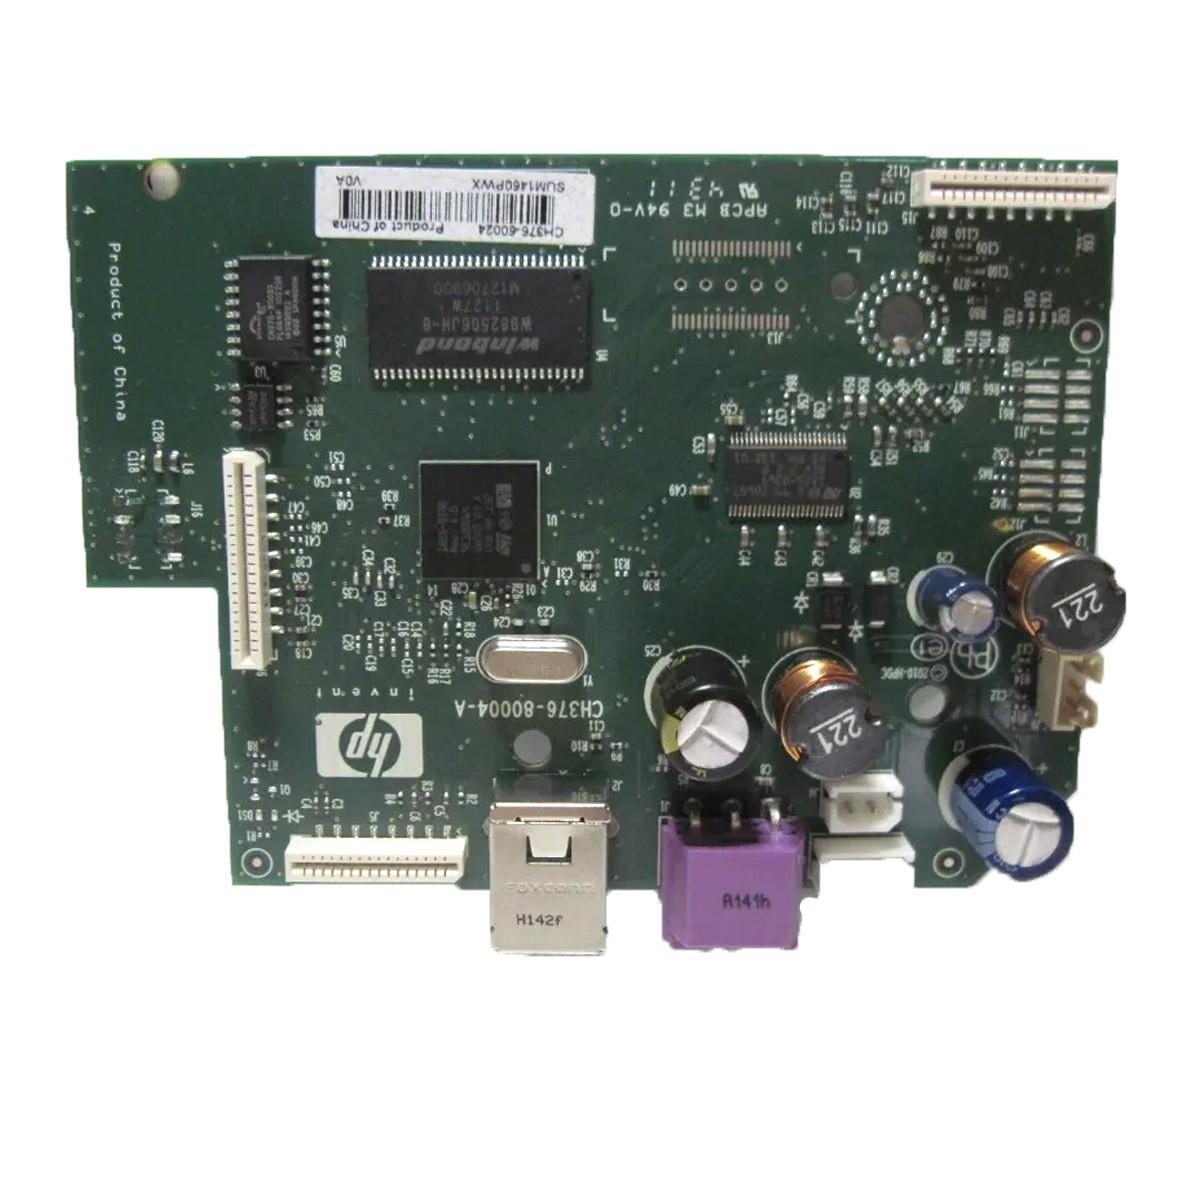 Placa Lógica Multifuncional HP PN:Ch376-80004-a + Placa Wifi Wirelles PN:Sdgob-0892- Retirado